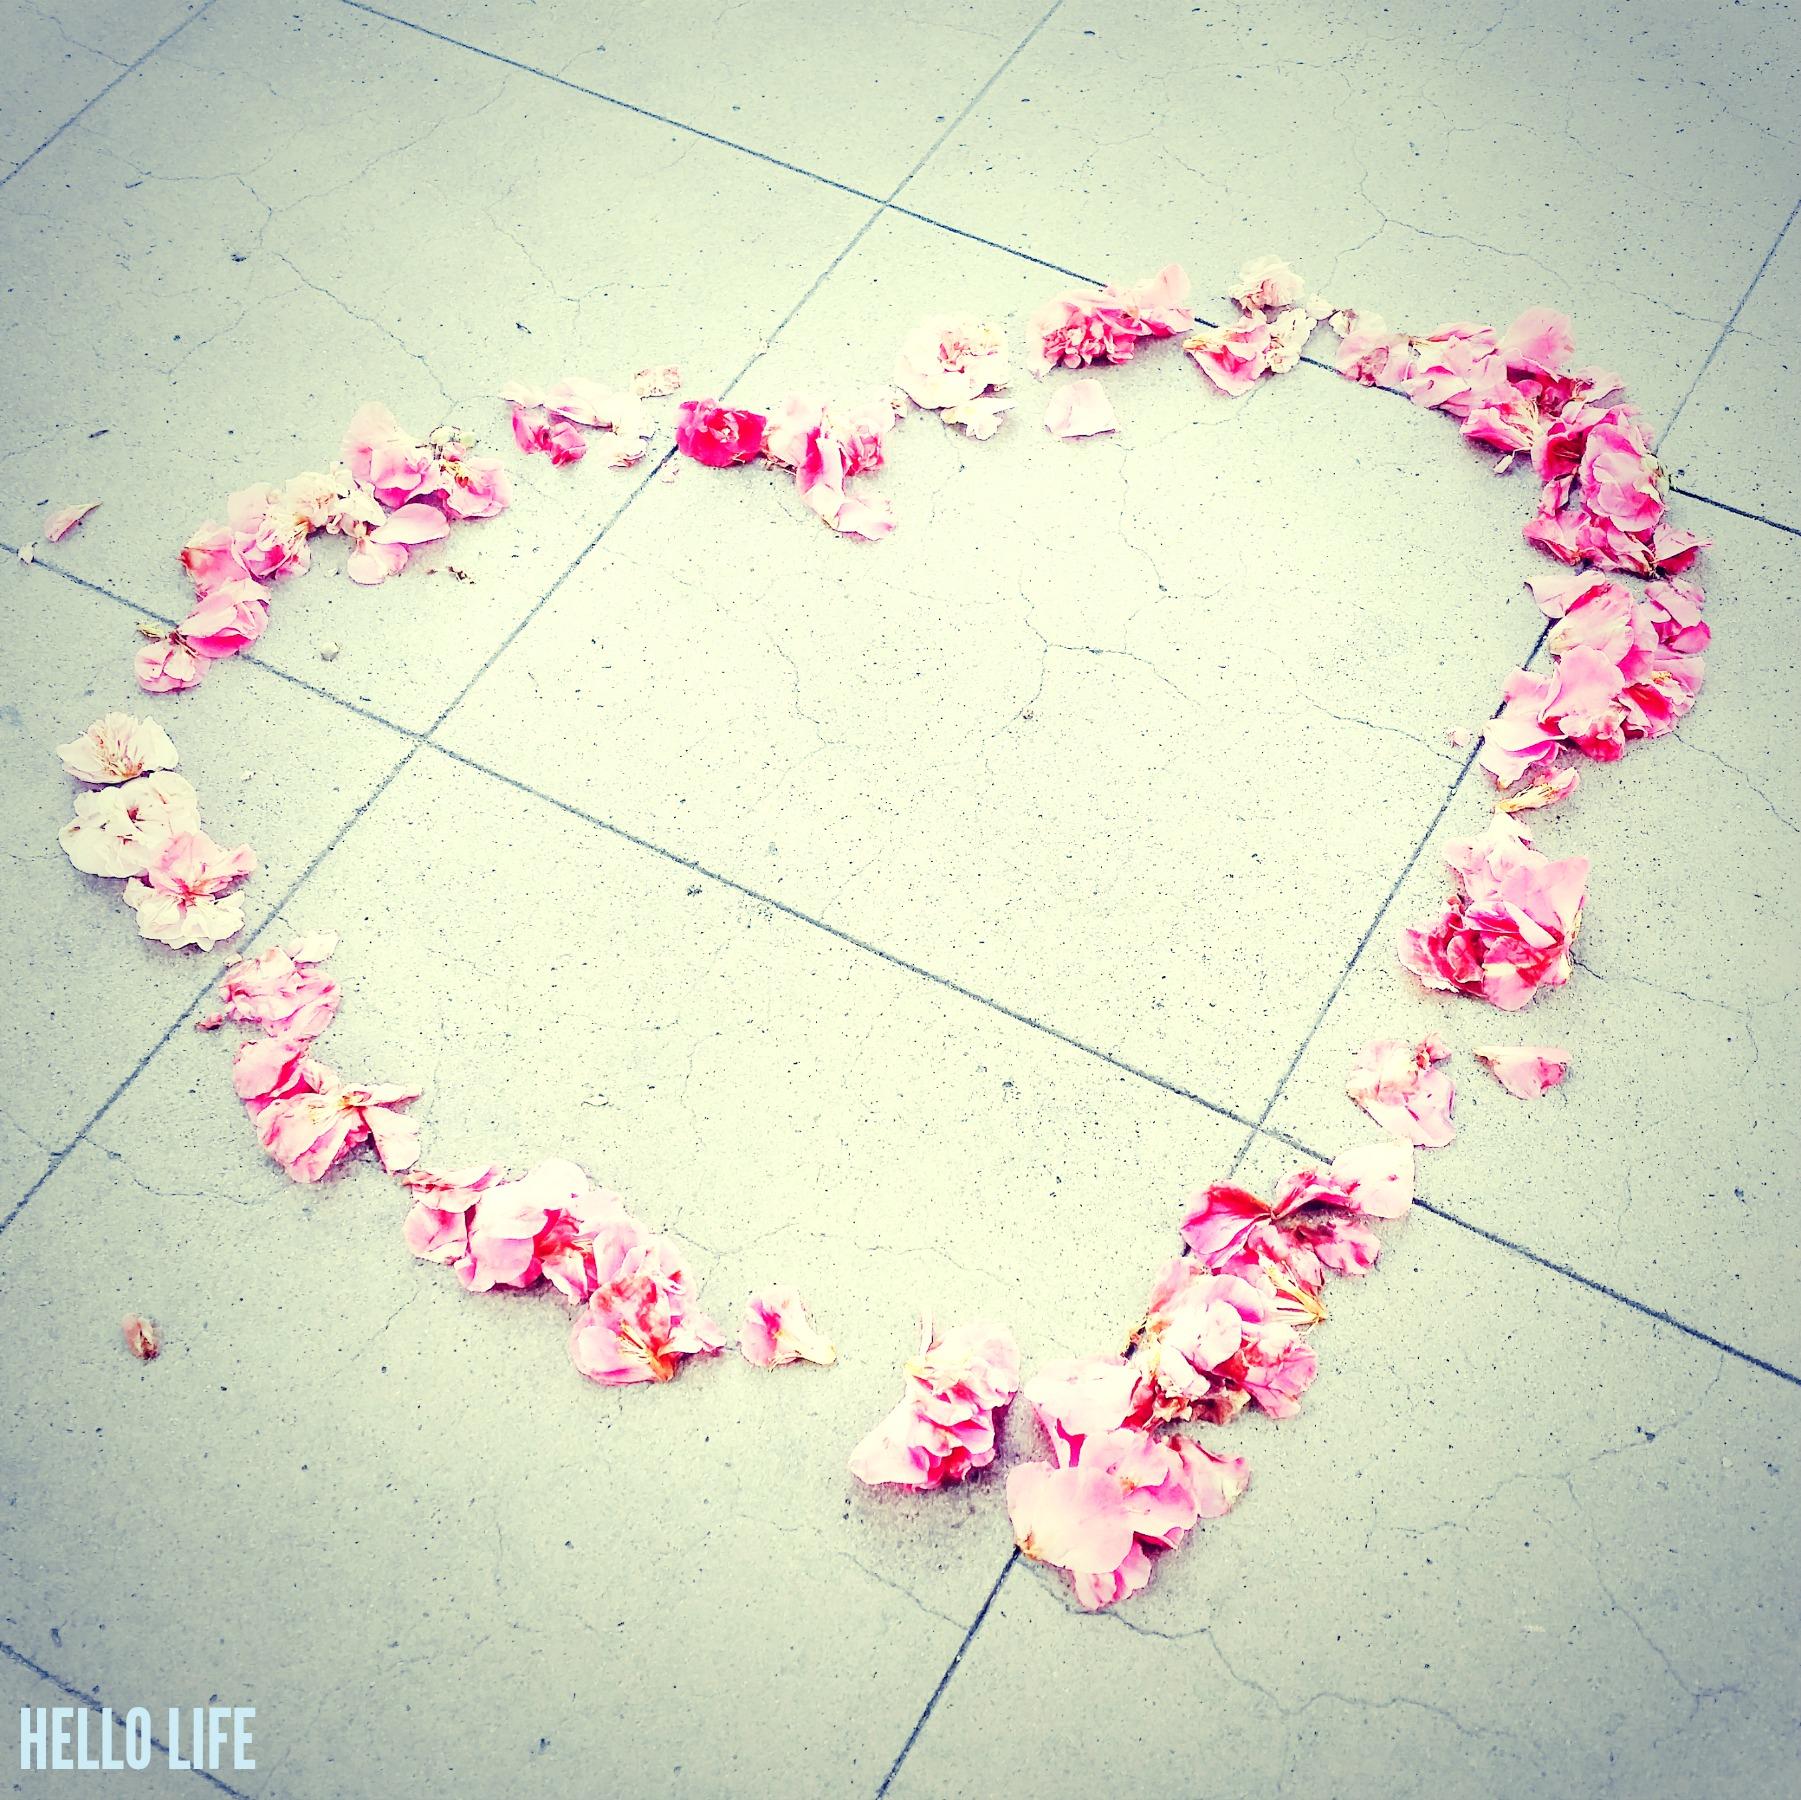 Flower Petals Heart via Hello Life hellolifeonline.com